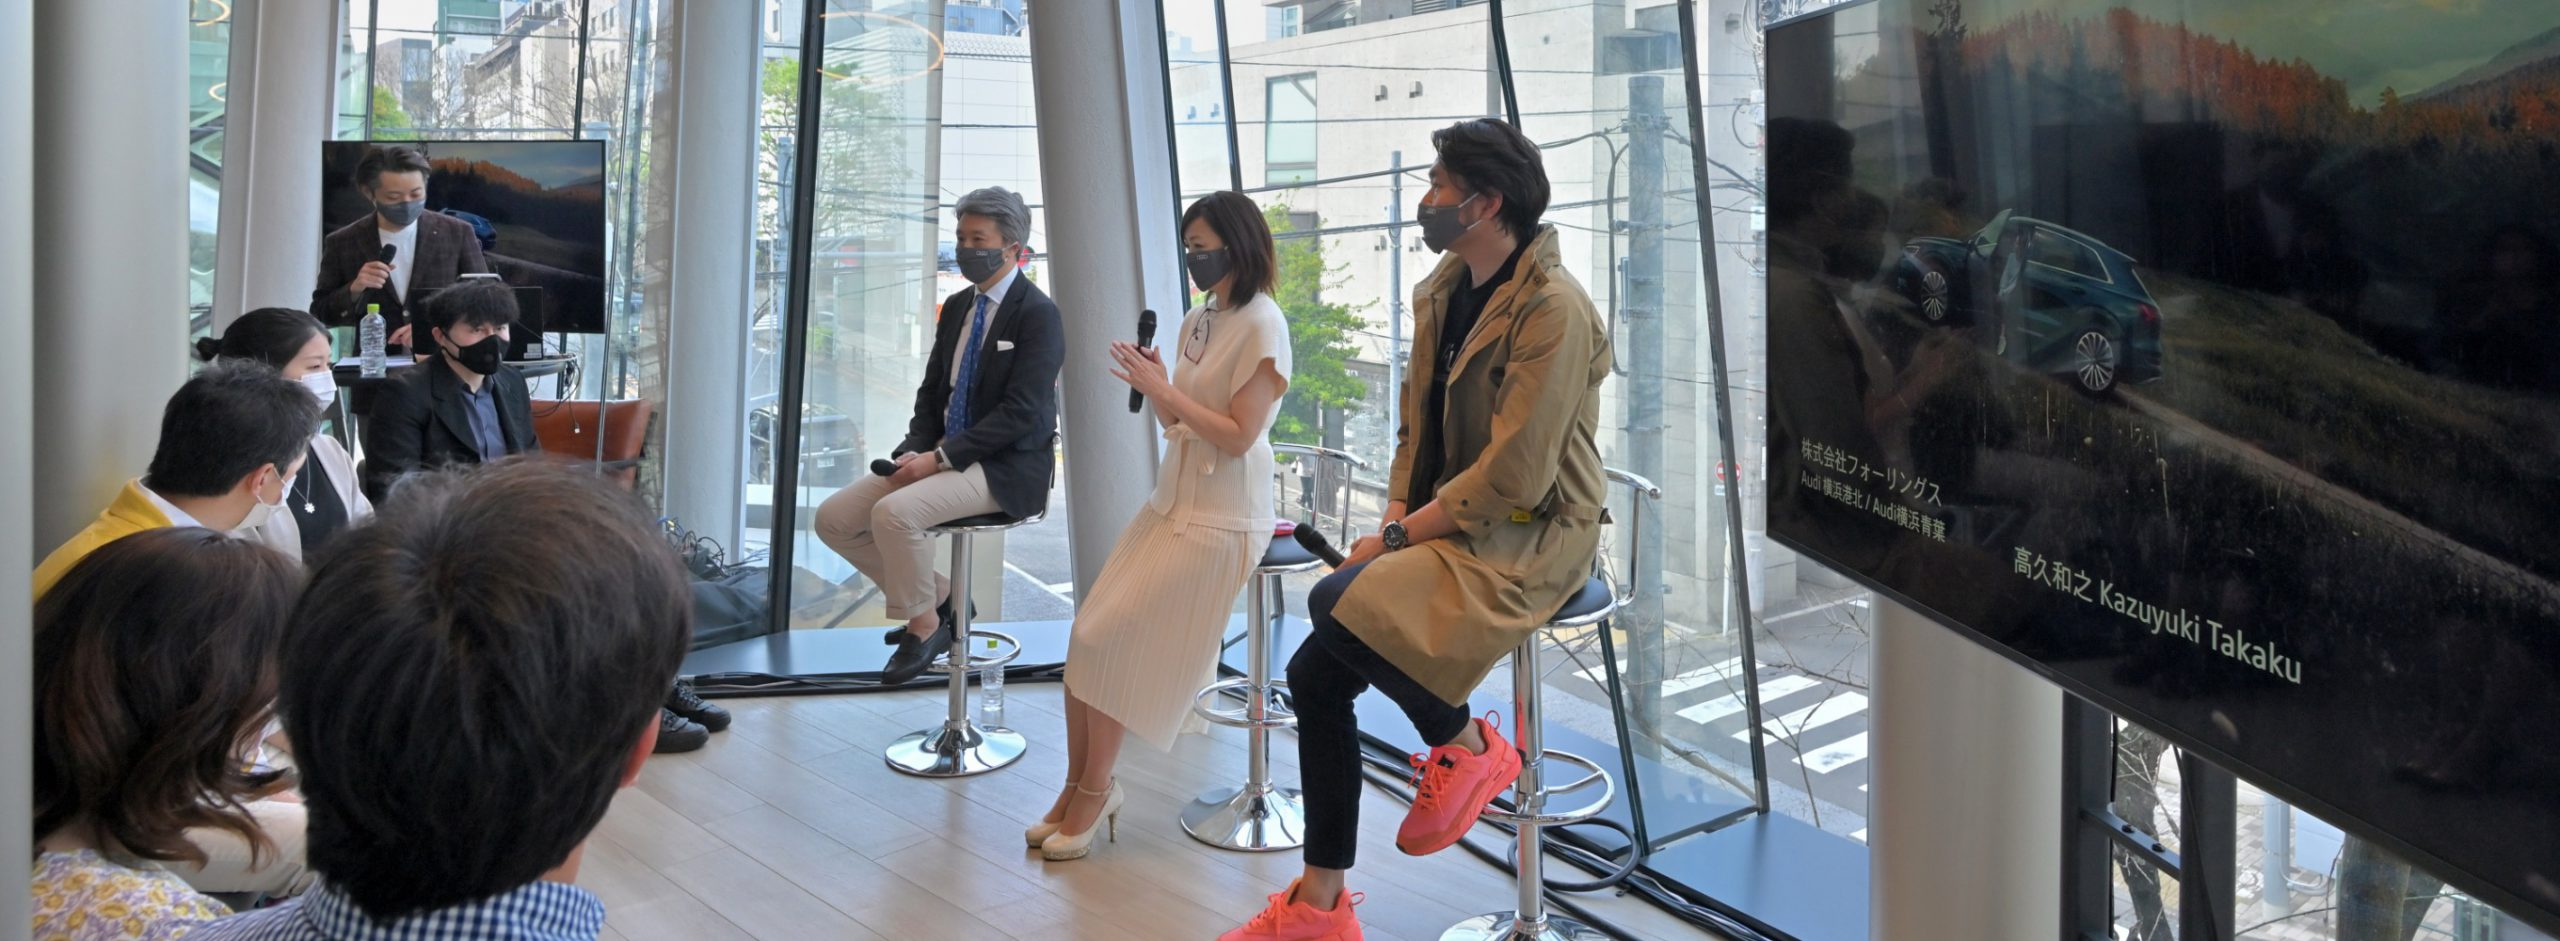 [Report] Audi × R100 TOKYO「Think Sustainability」イベント体験記